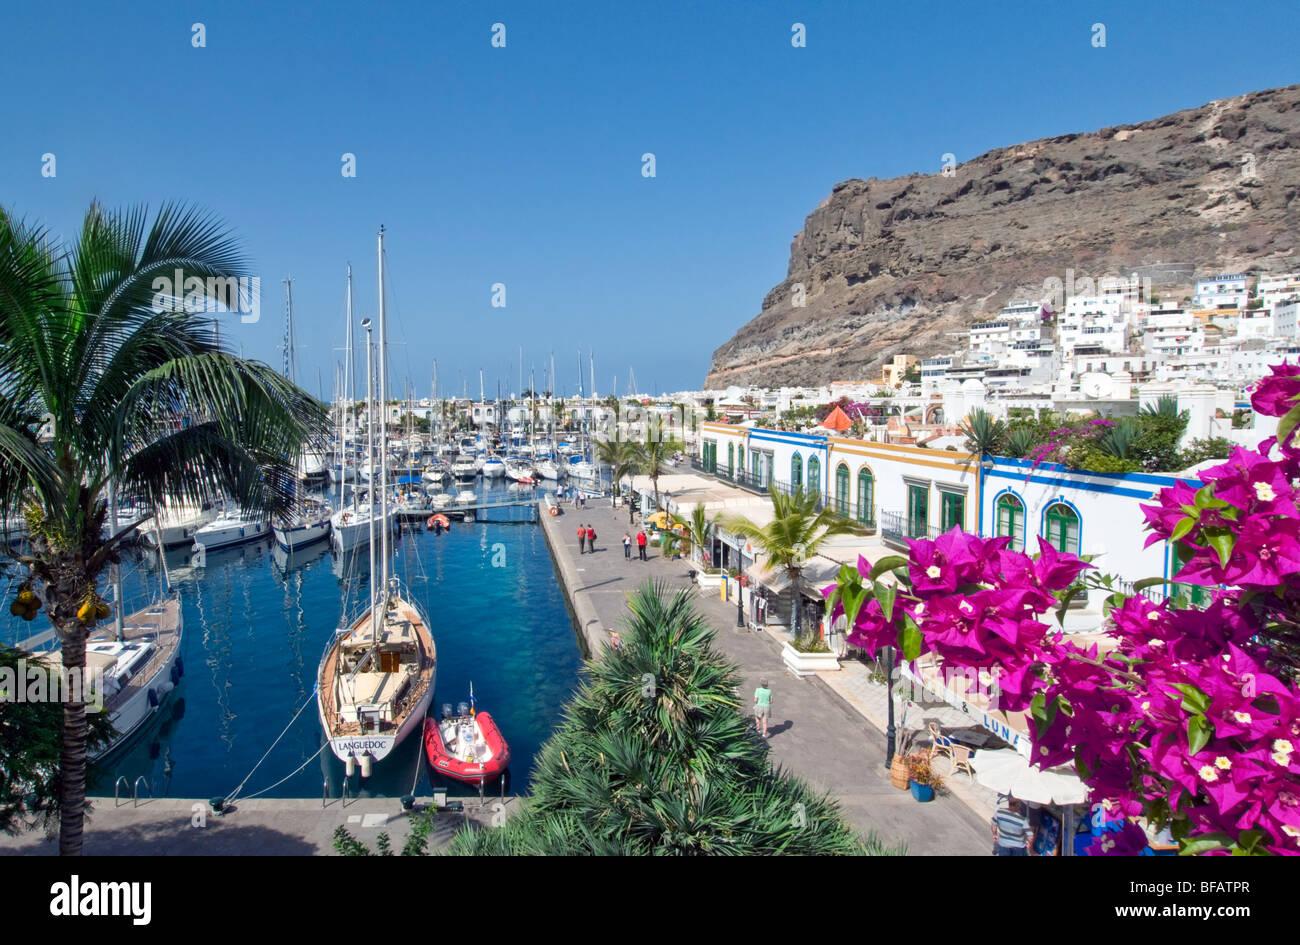 Puerto de Mogan view over bougainvillea flowers to yacht marina  promenade and restaurants  Gran Canaria Canary - Stock Image